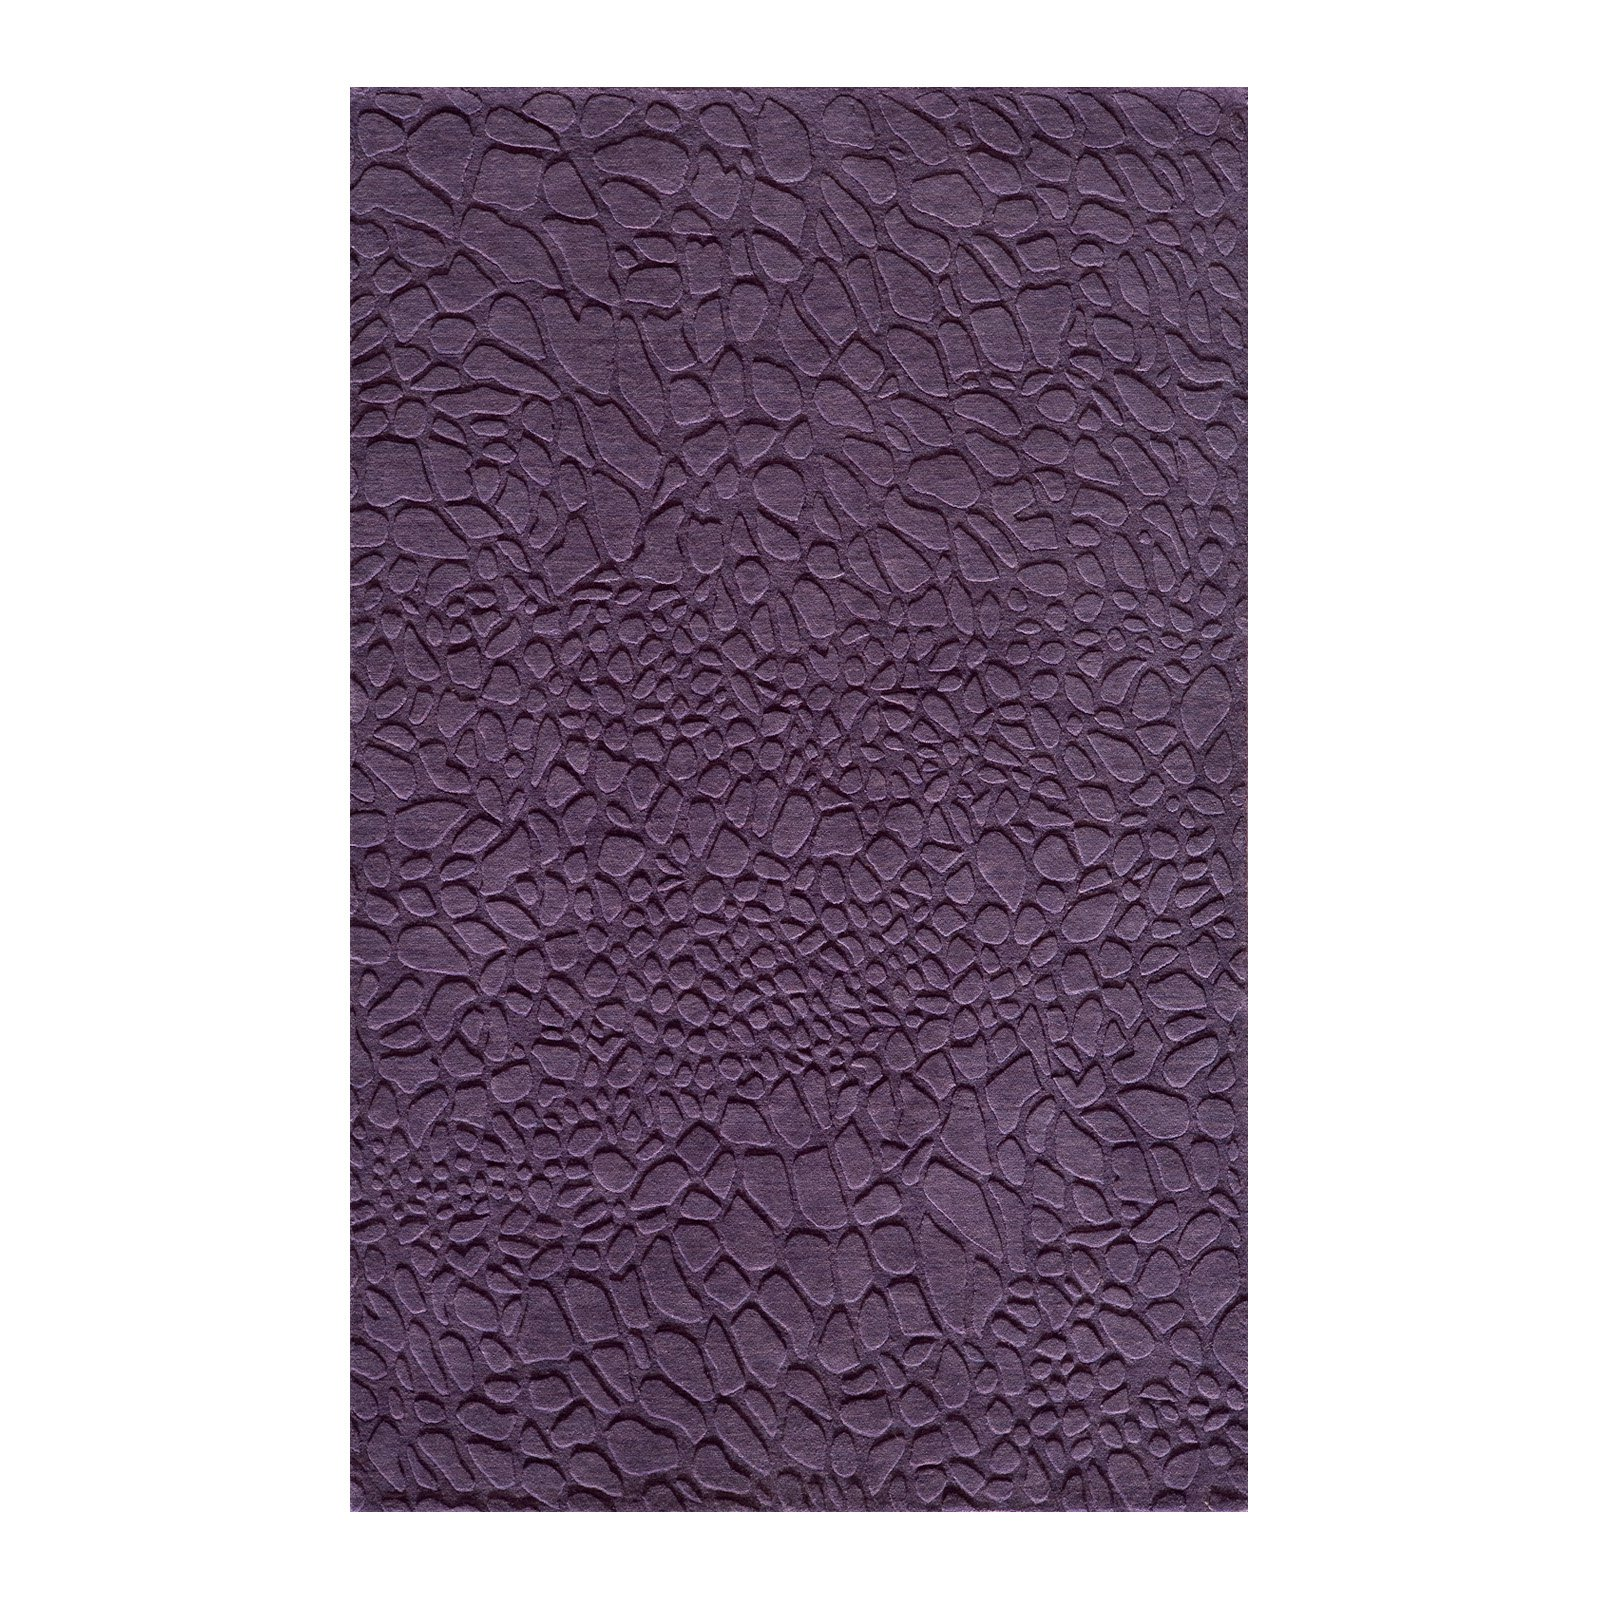 Momeni Gramercy GM-11 Area Rug - Purple